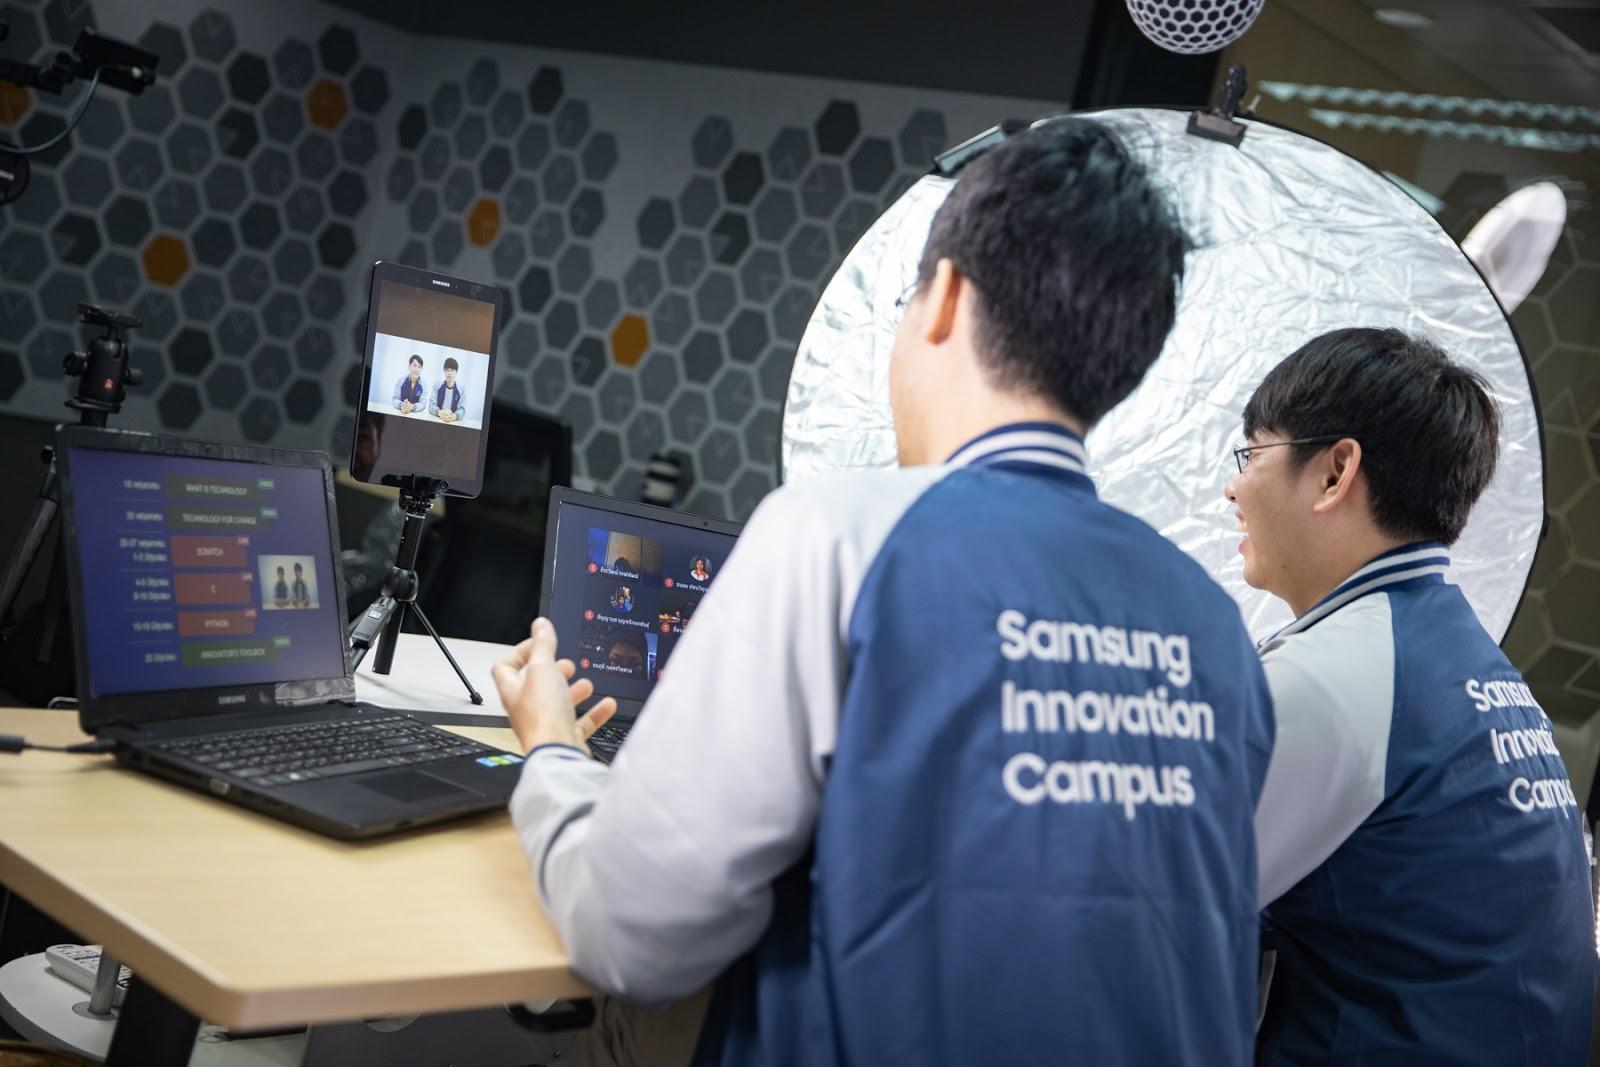 Samsung ลุยสอน Coding ผ่านโครงการ Samsung Innovation Campus เสริมพลังเด็กไทย ชูออนไลน์แพลตฟอร์ม รับสถานการณ์ปัจจุบัน